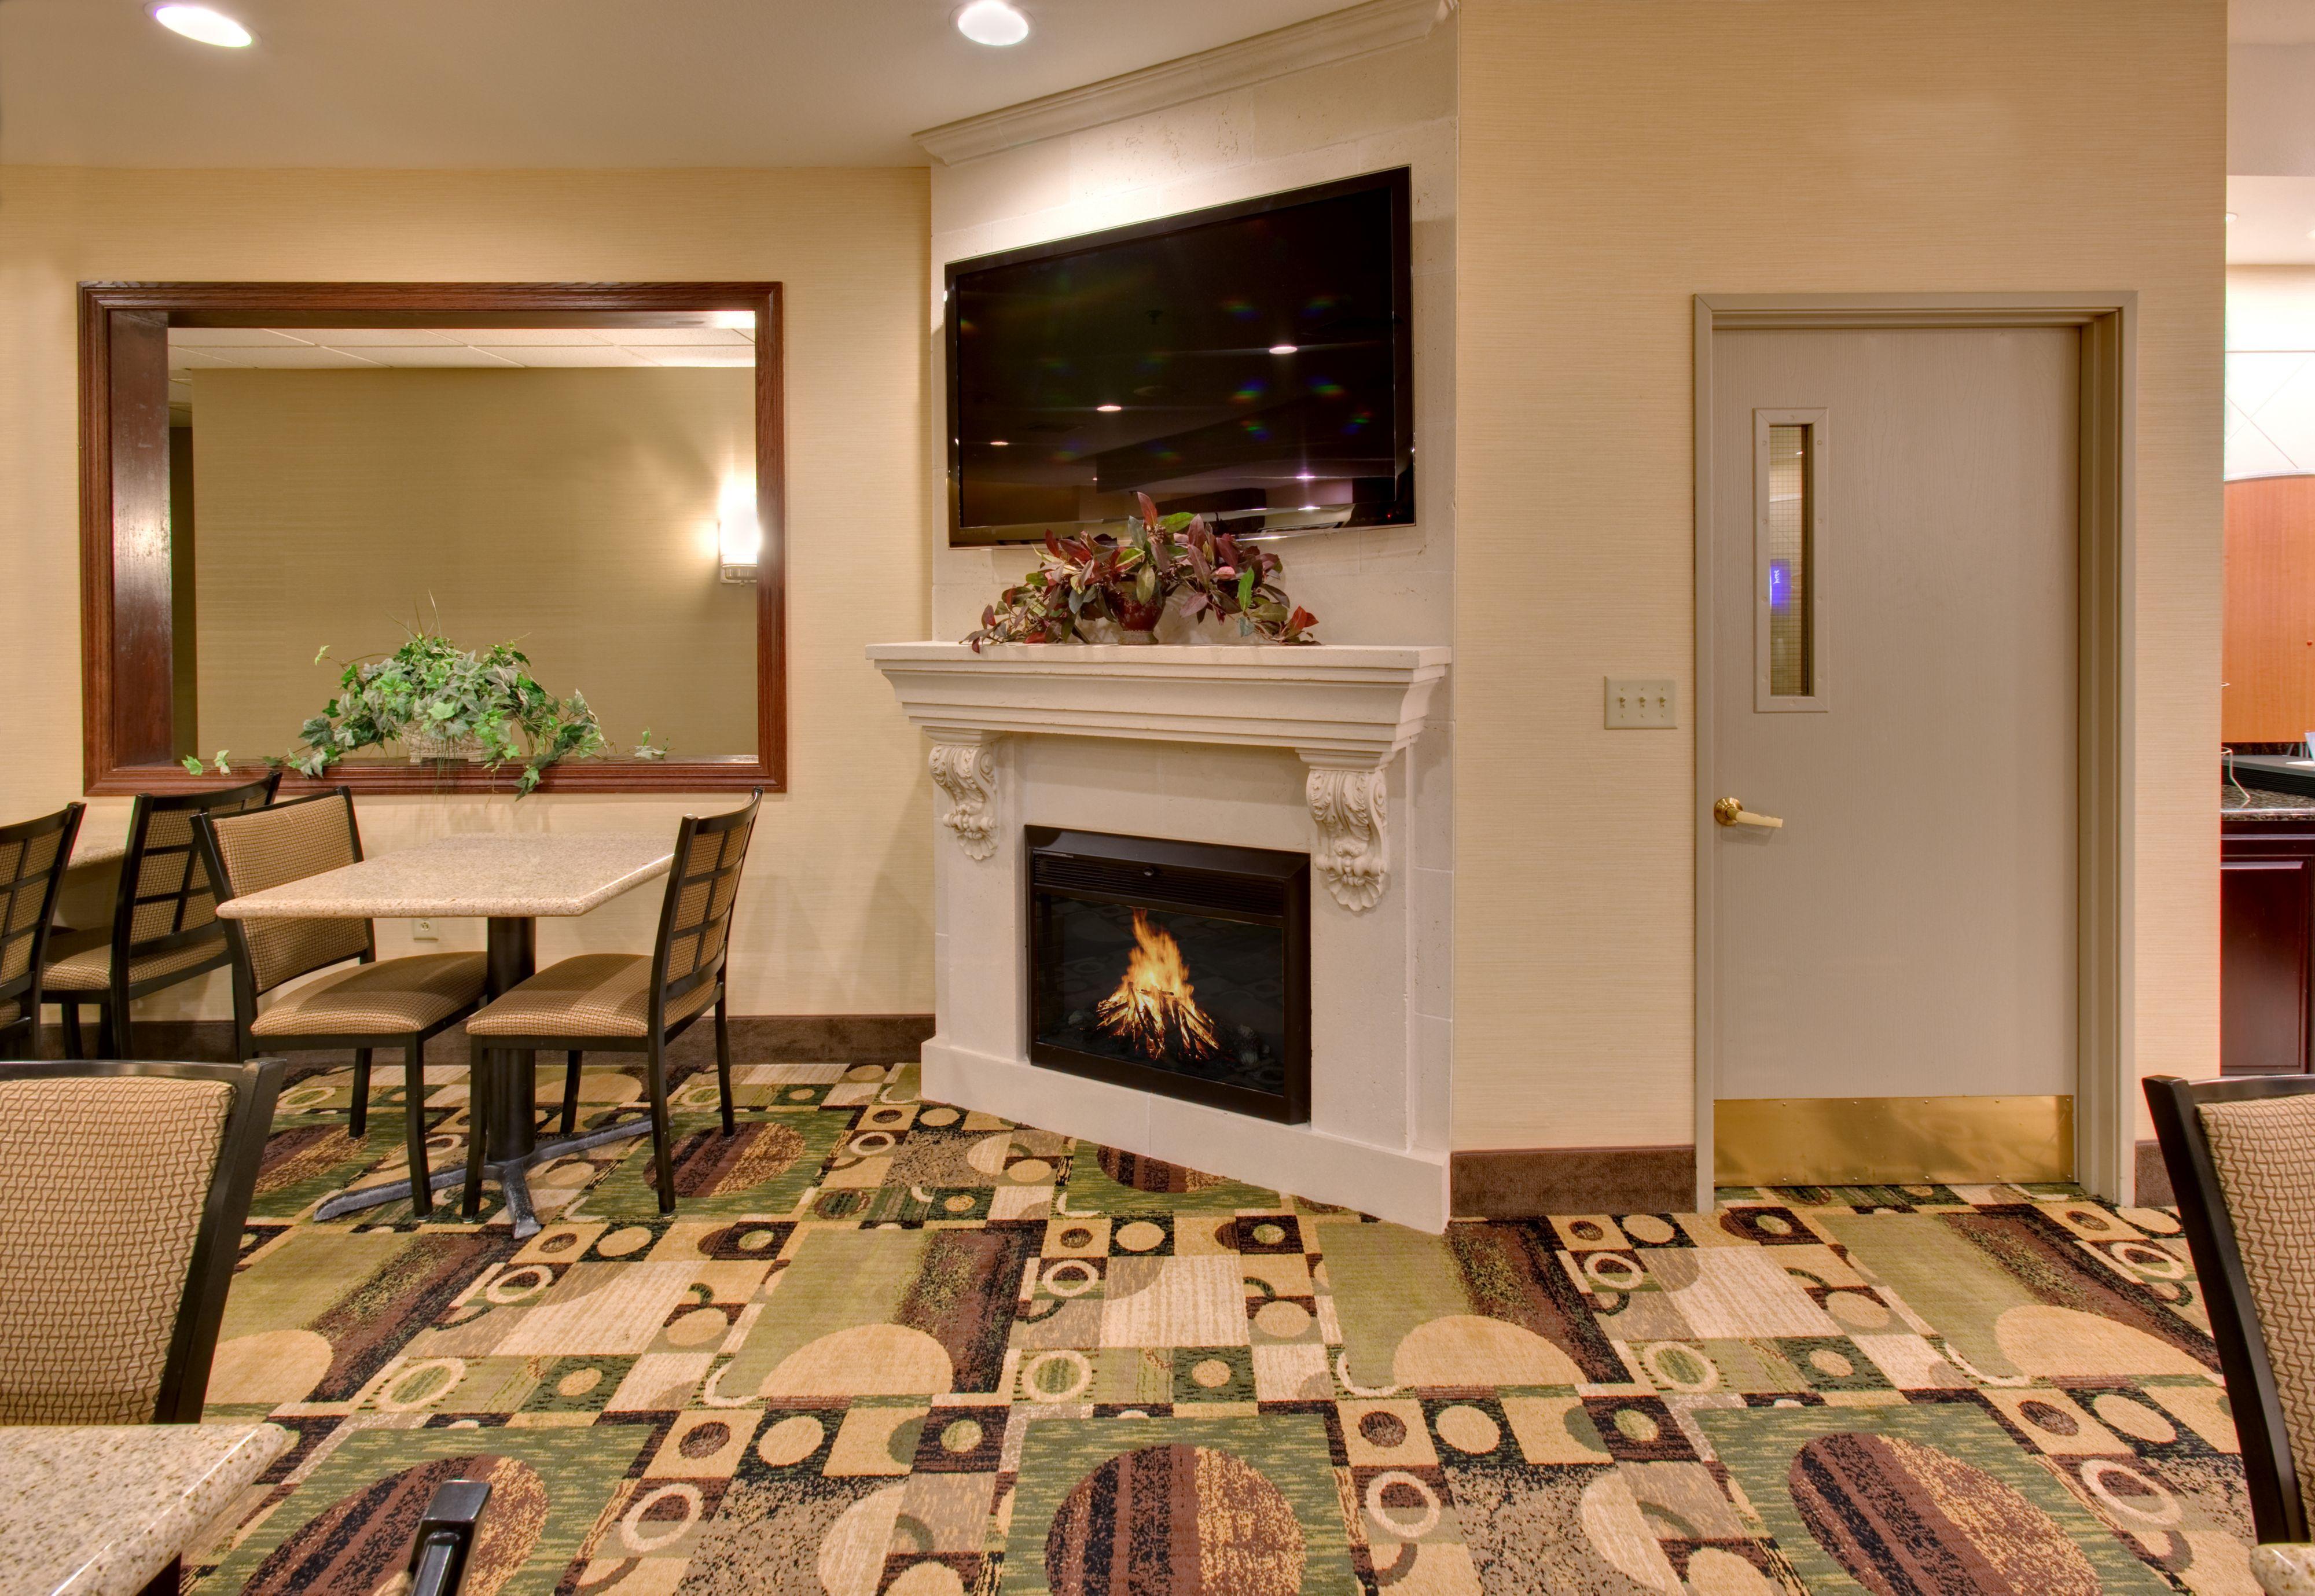 Holiday Inn Express & Suites Pleasant Prairie / Kenosha image 4